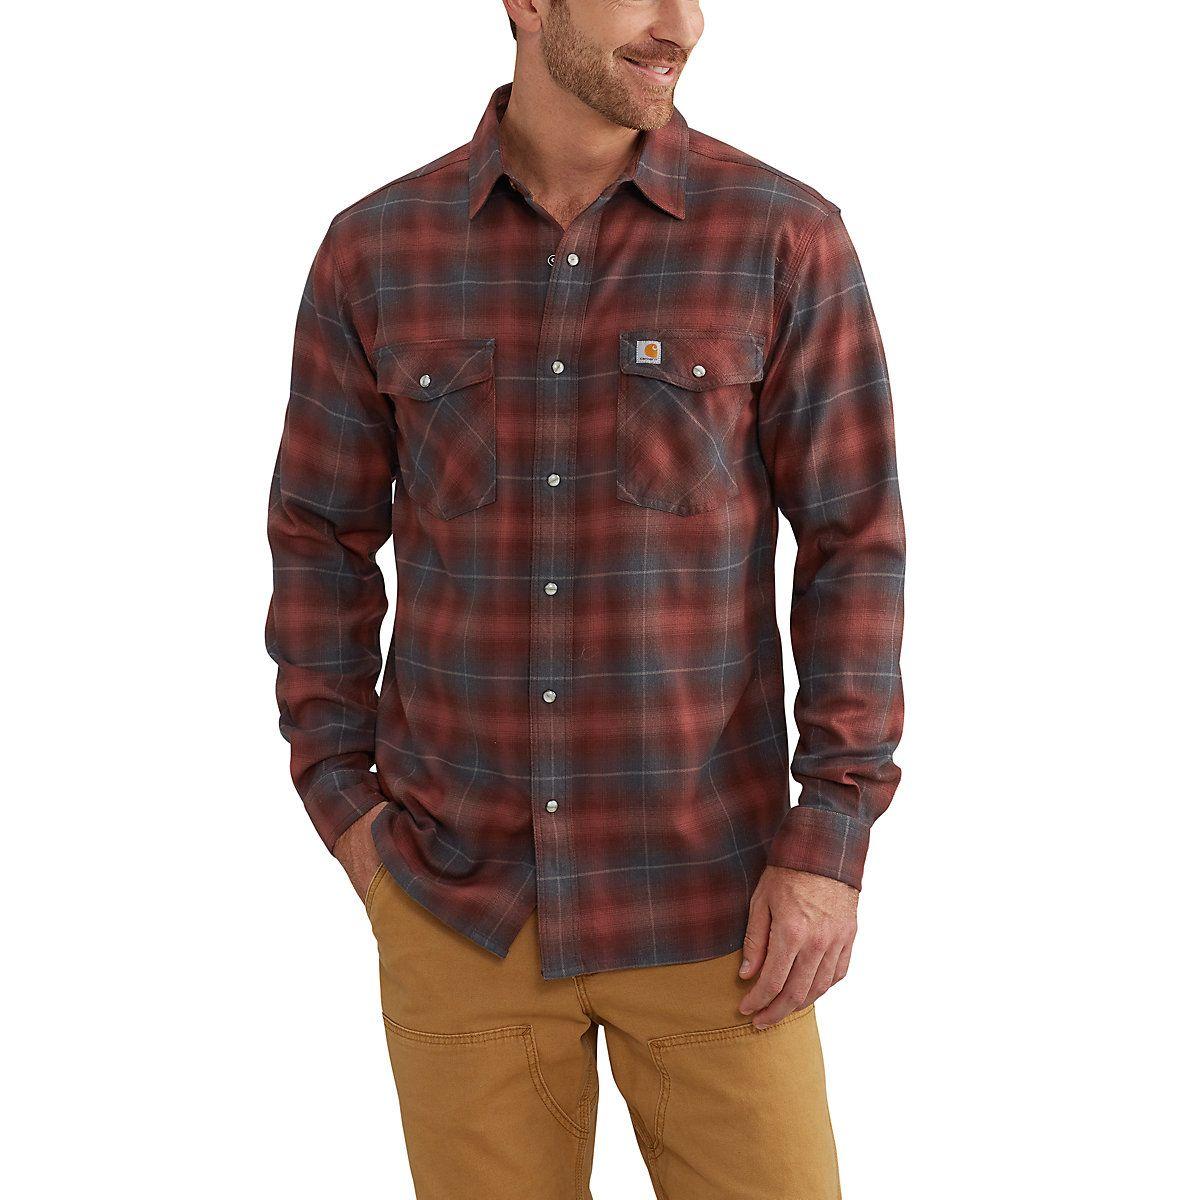 Orange flannel jacket  Menus RelaxedFit Stretch Long Sleeve Shirt  Utilitarian Fashion